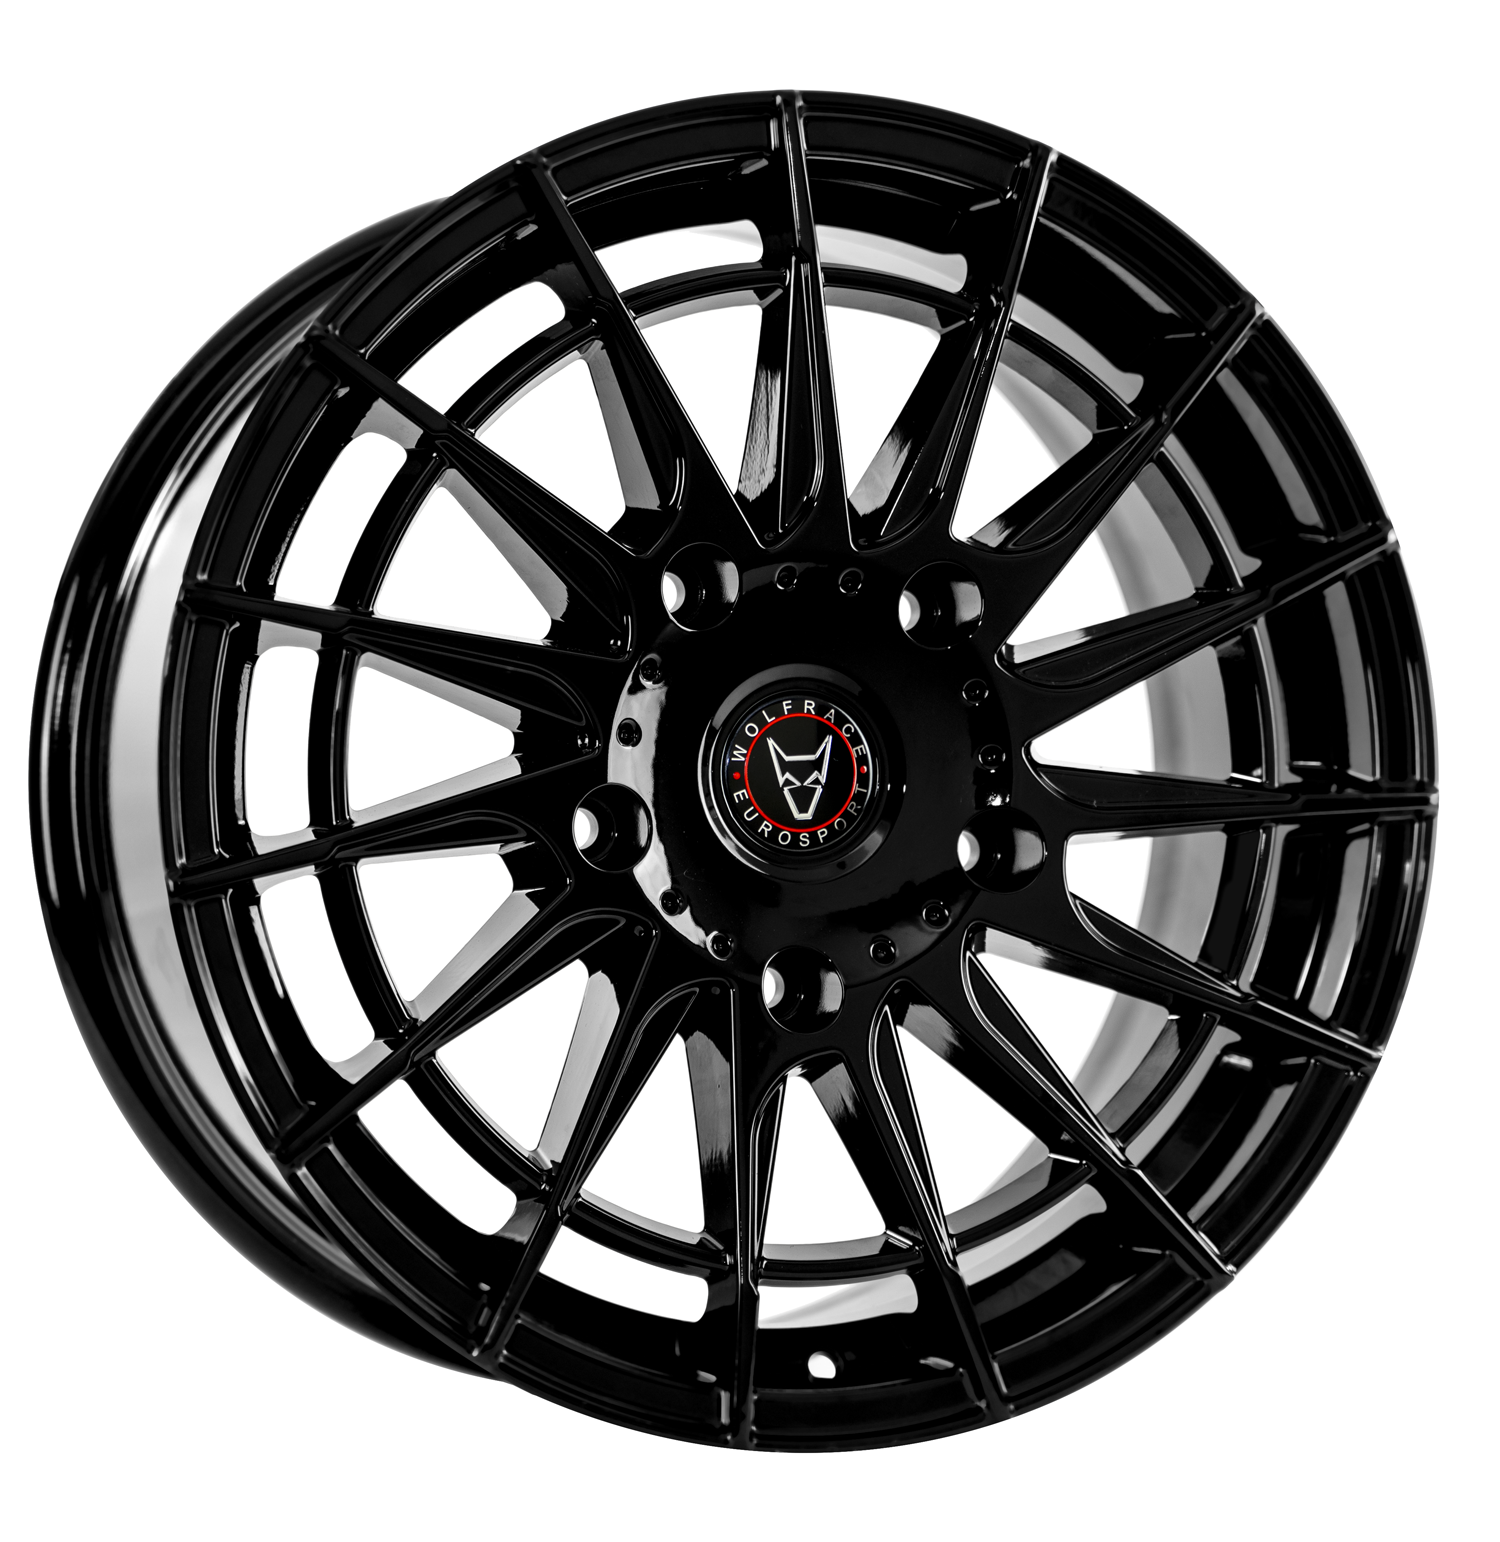 Wolfrace Eurosport - Aero Super-T (Gloss Black)